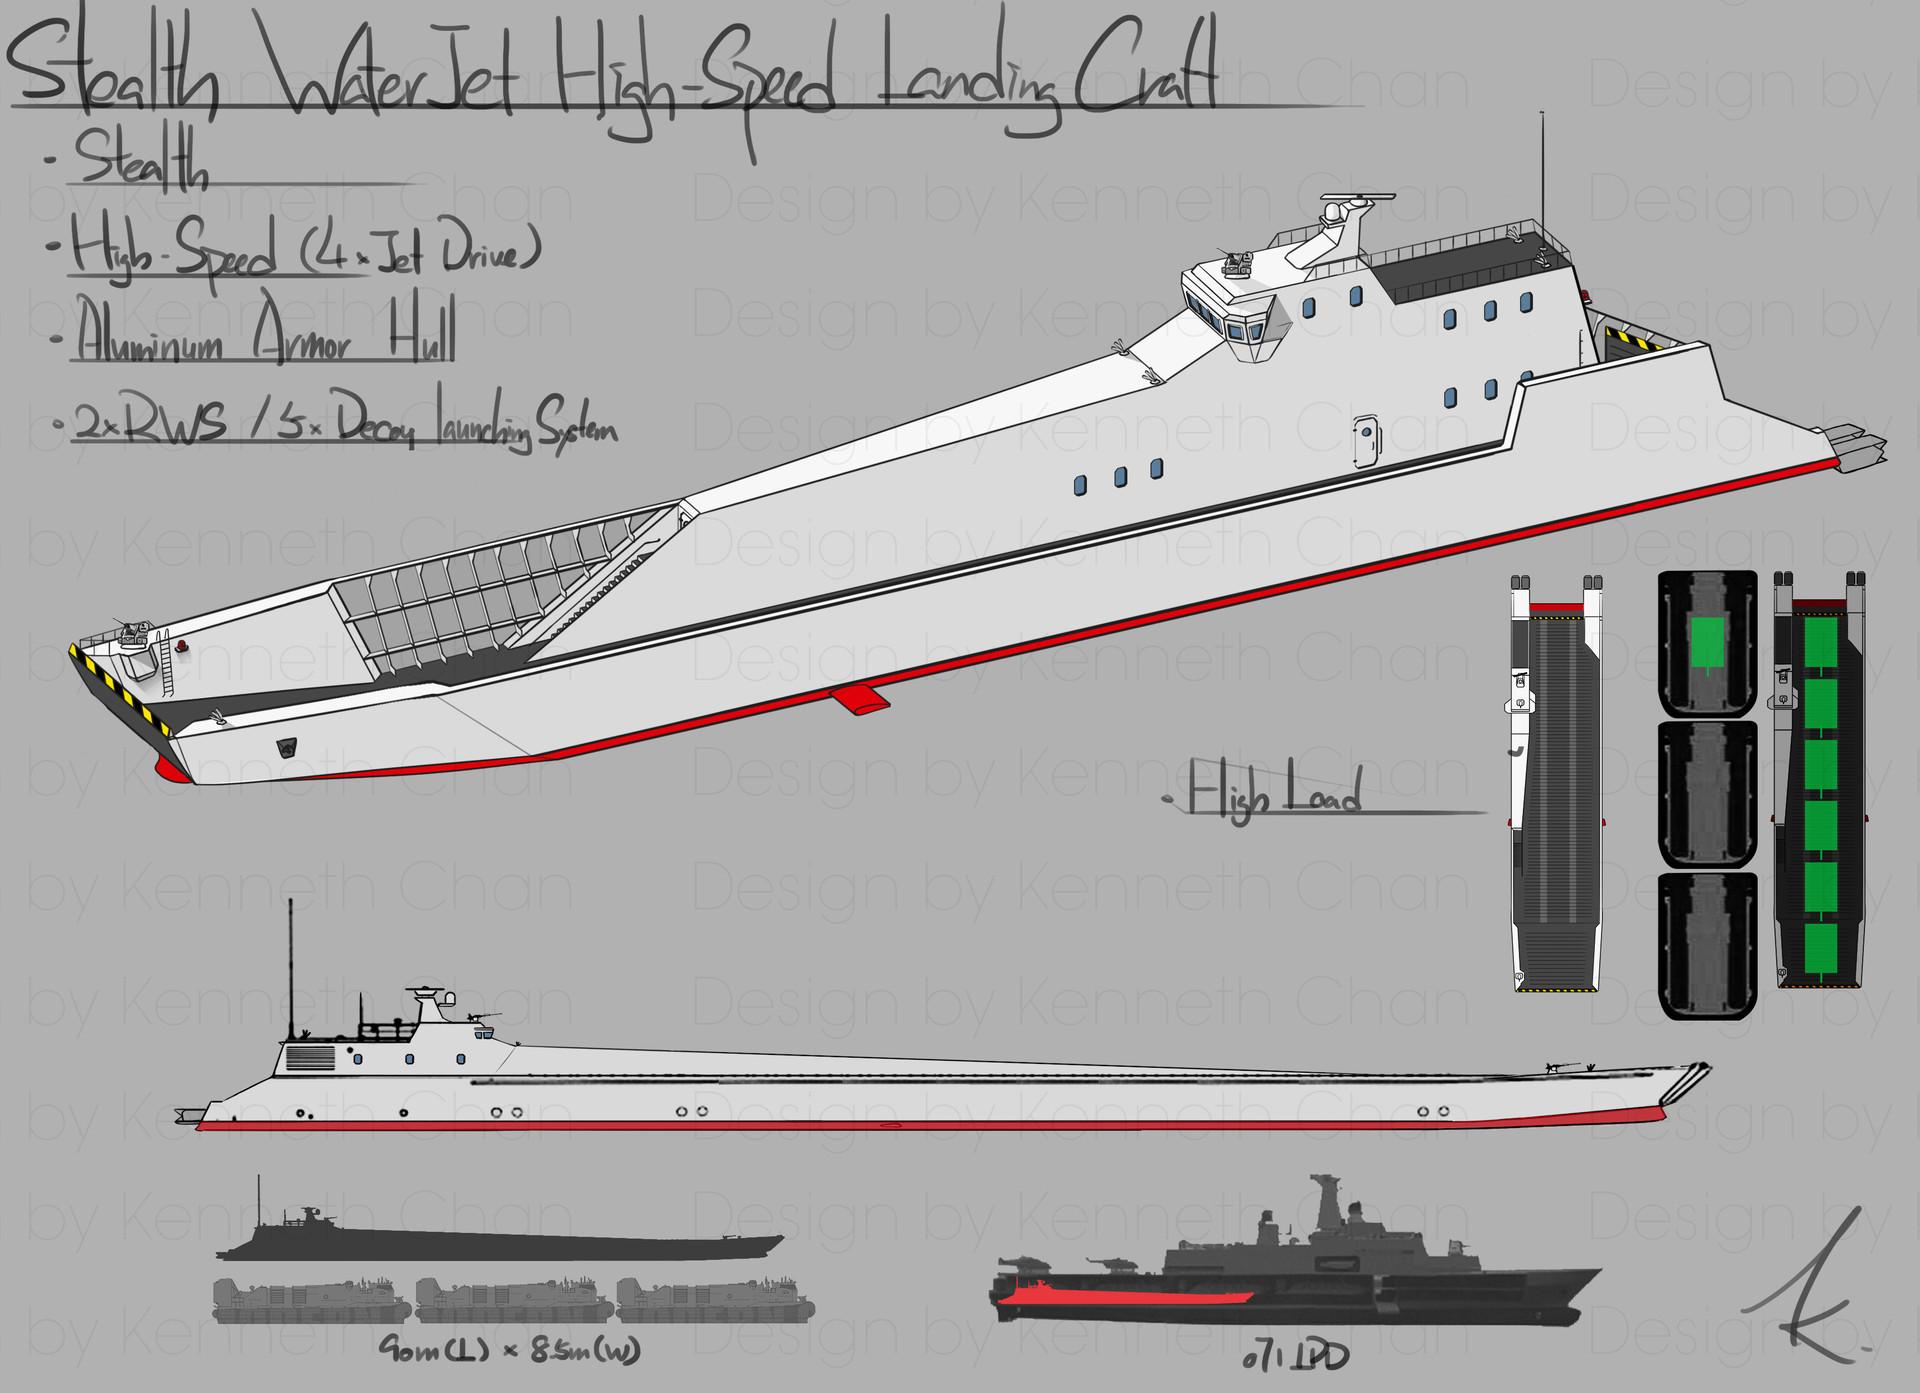 Stealth WaterJet High-Speed Landing Craft